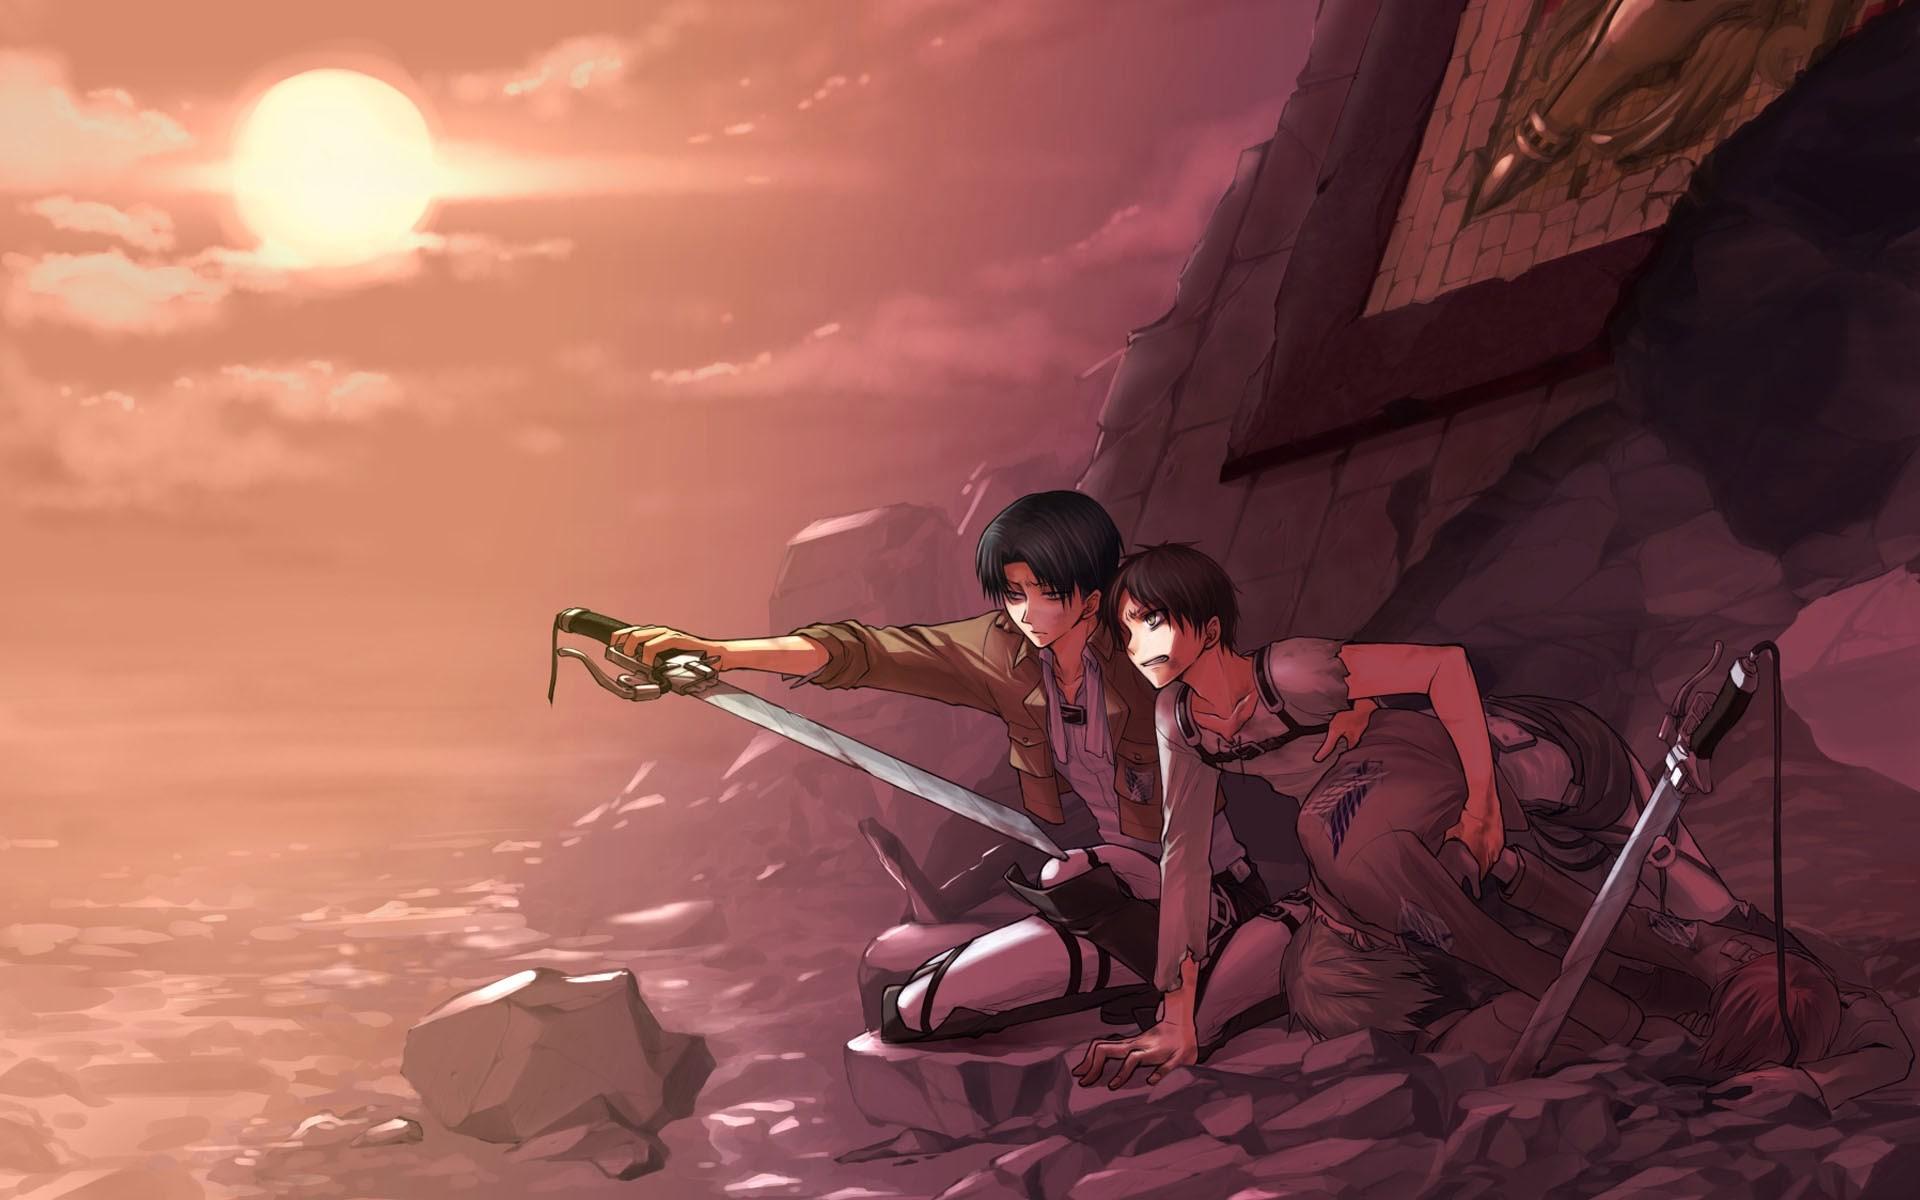 Levi Eren Armin Attack On Titan Shingeki No Kyojin Attack On Titan Wallpaper Levi Eren 1920x1200 Download Hd Wallpaper Wallpapertip